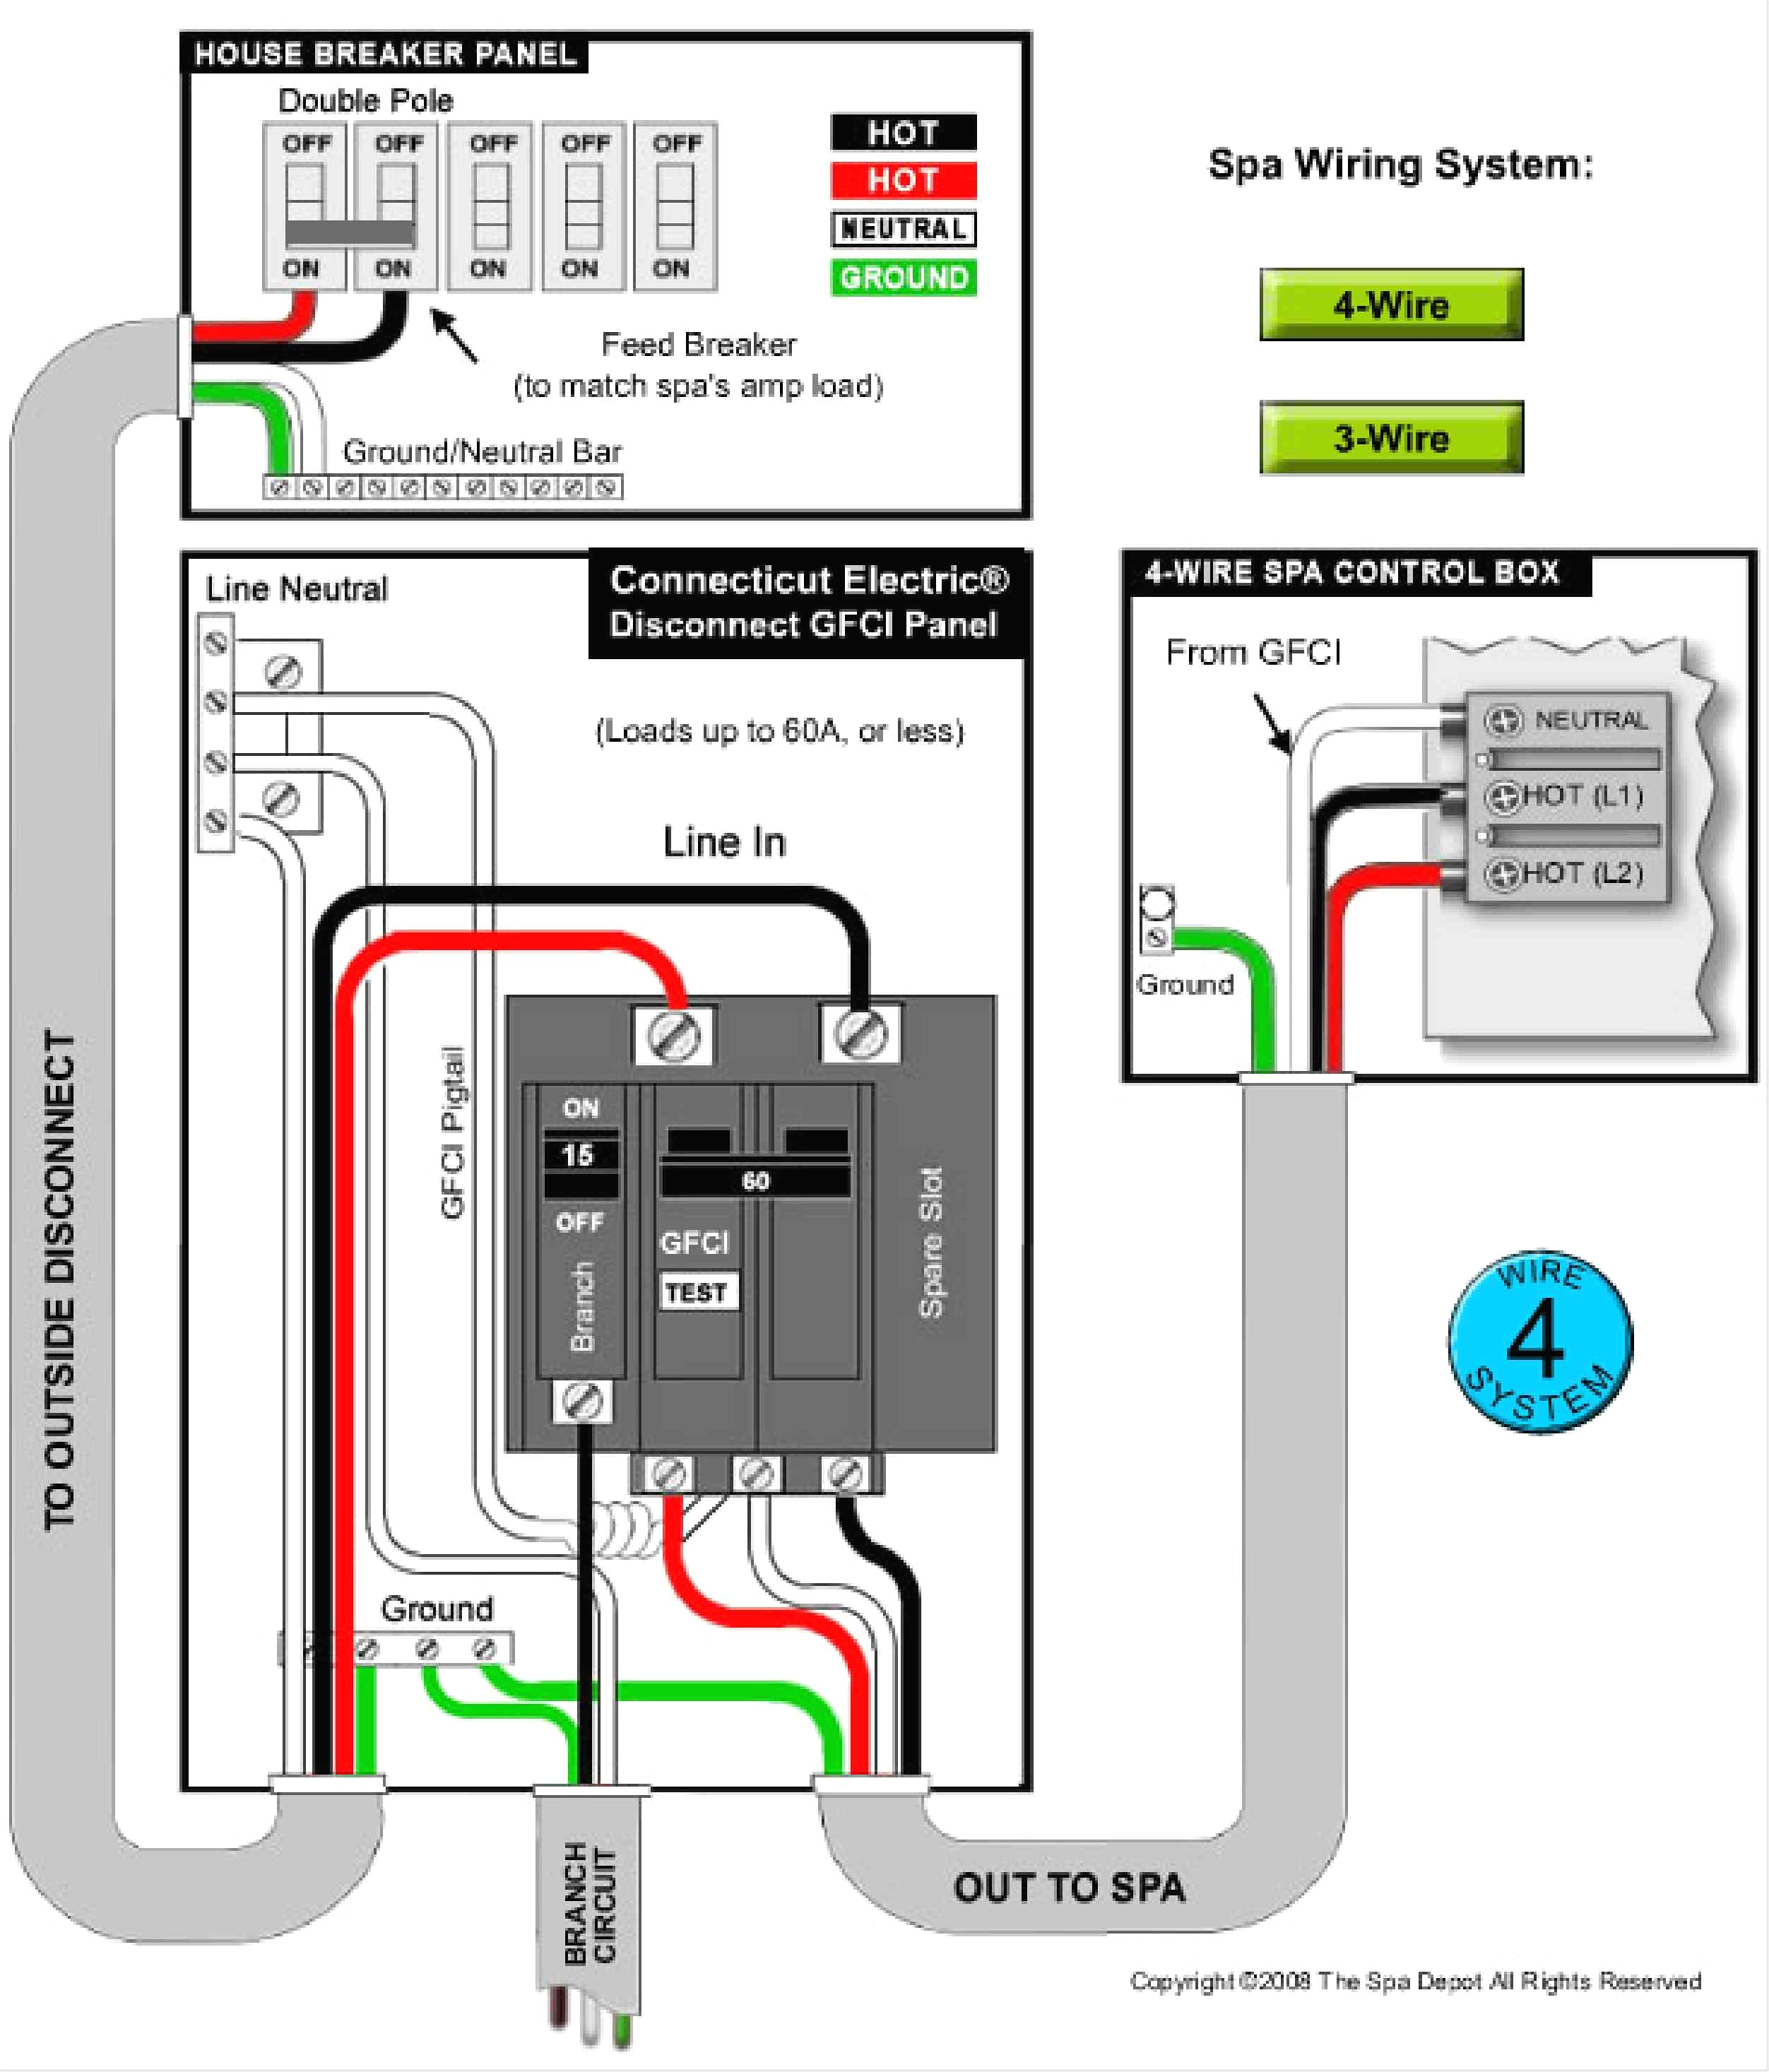 HF_1099] 2591D1171461188 Change Hot Tub Heater Wiring Hot Tub Wiring Sjpg Schematic  WiringEopsy Inama Mohammedshrine Librar Wiring 101